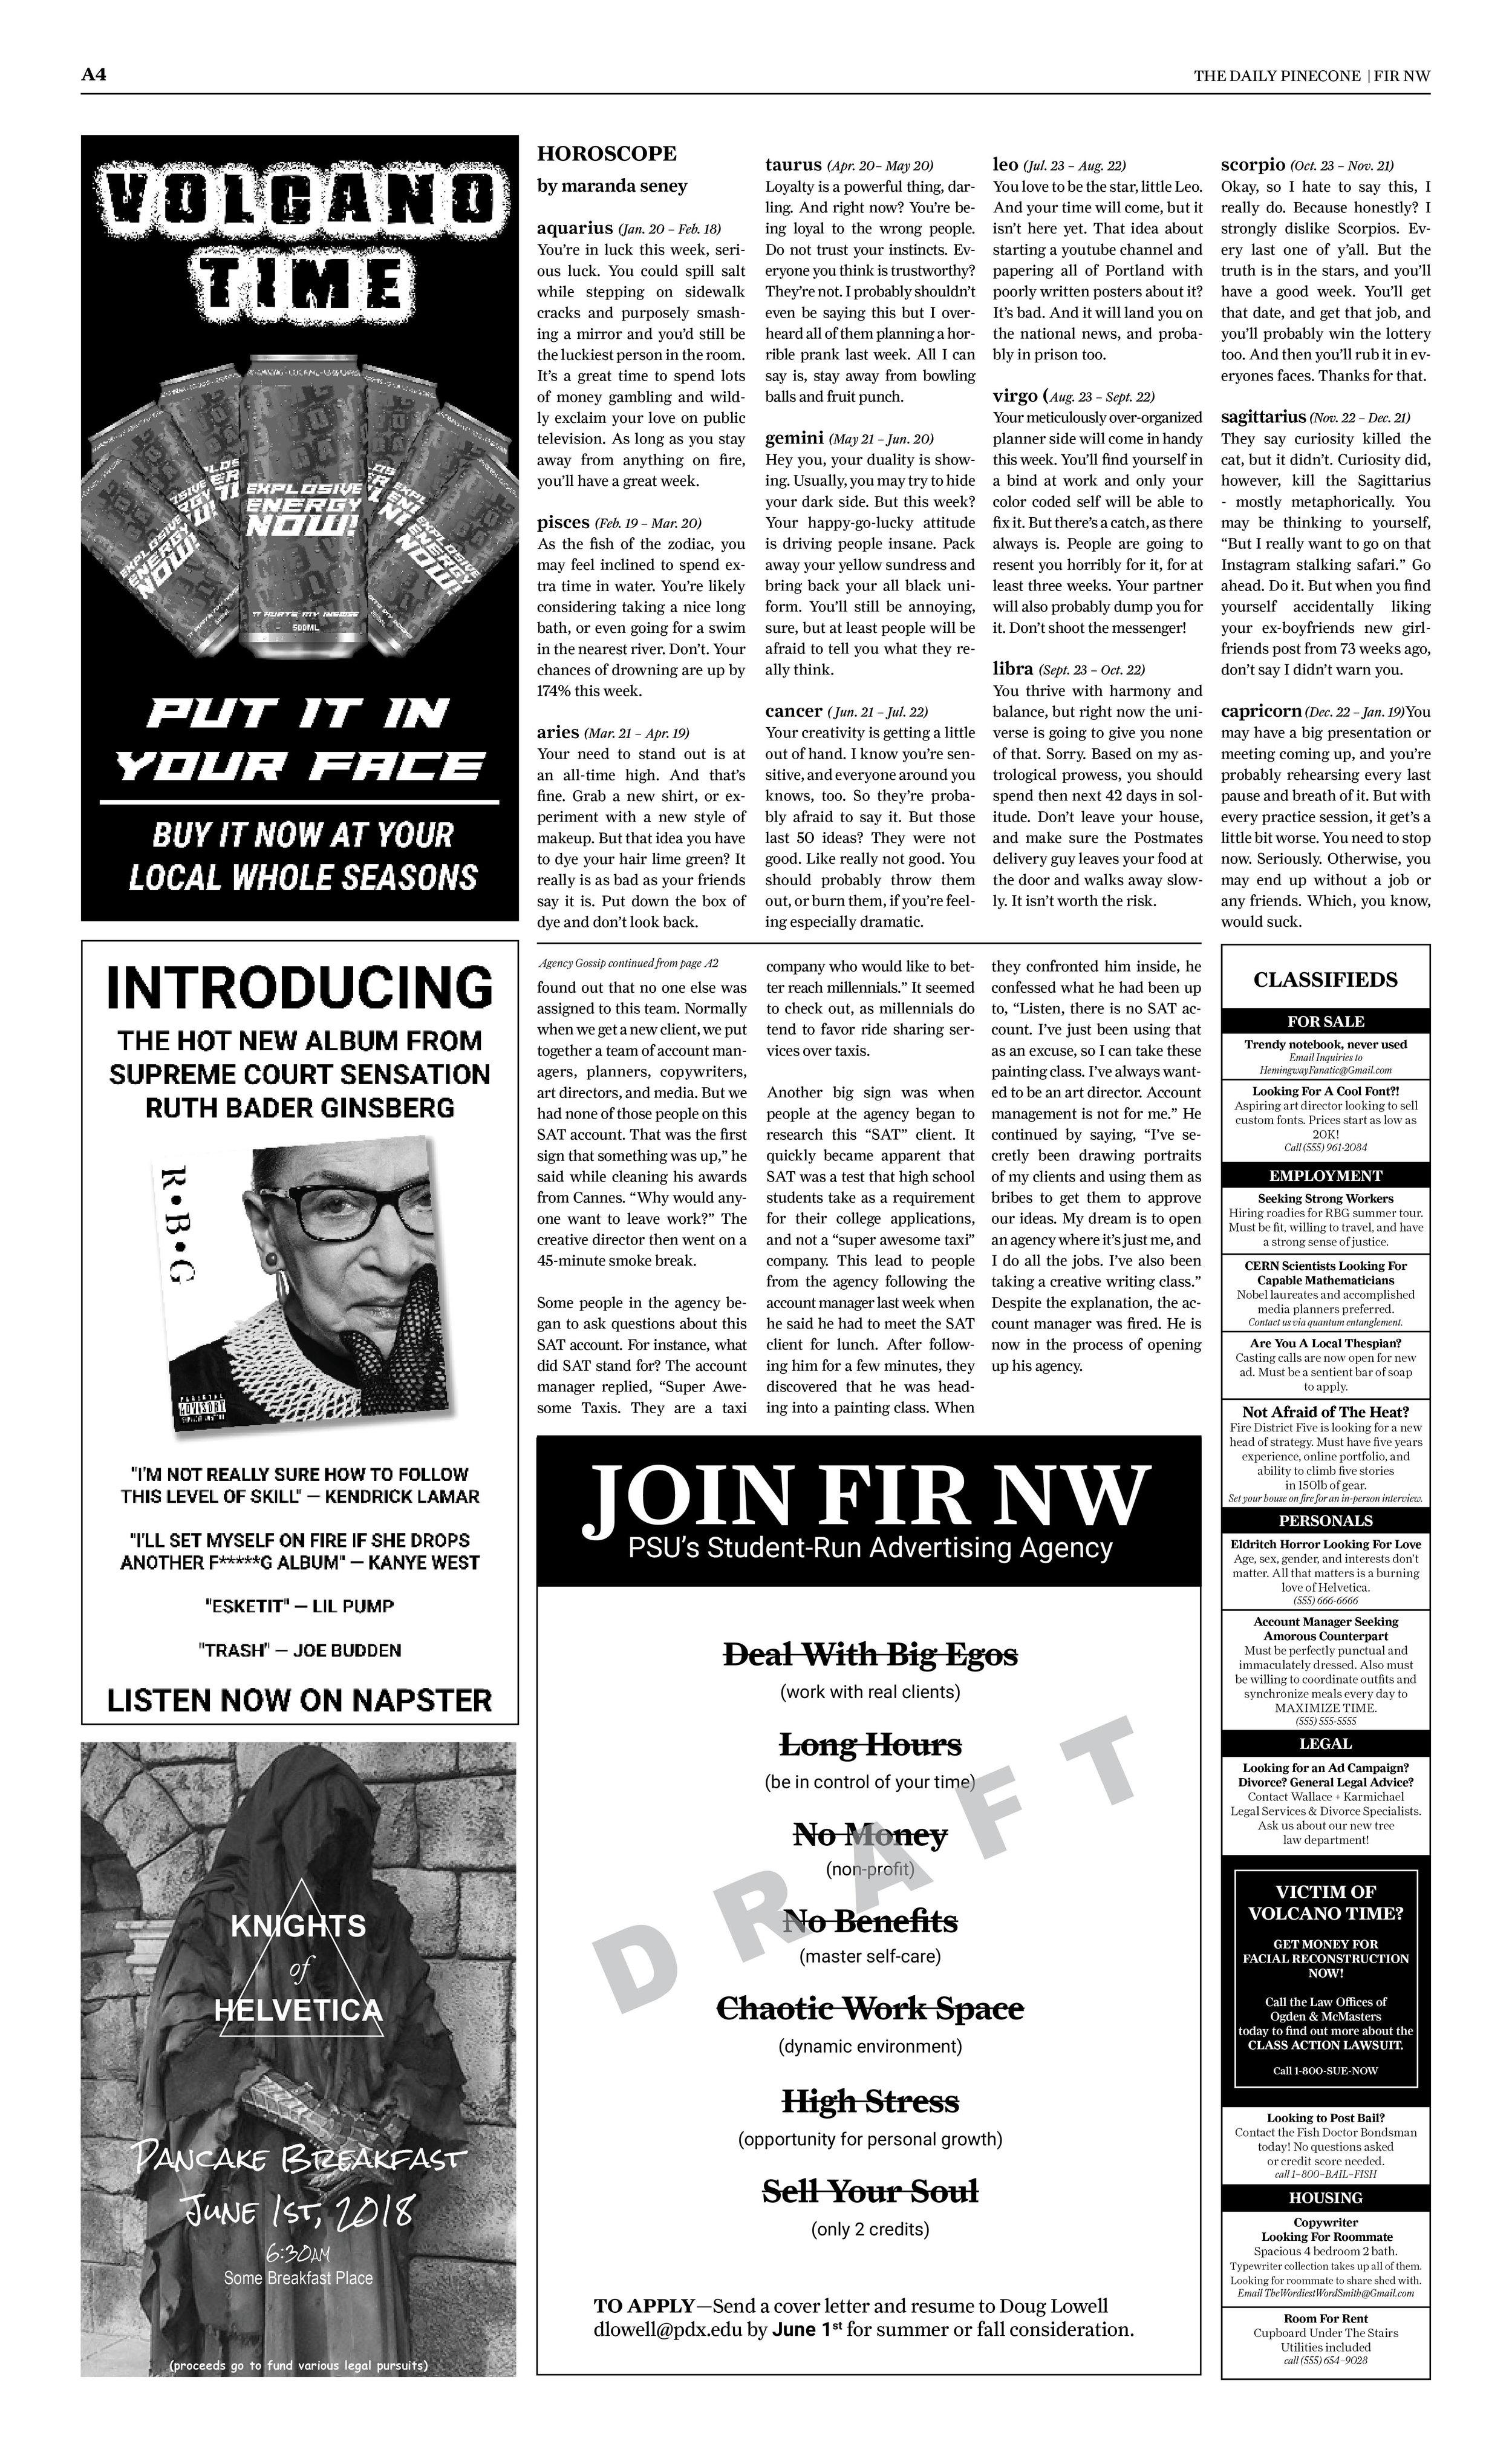 DailyPinecone_newspaper_r6 copy4.jpg